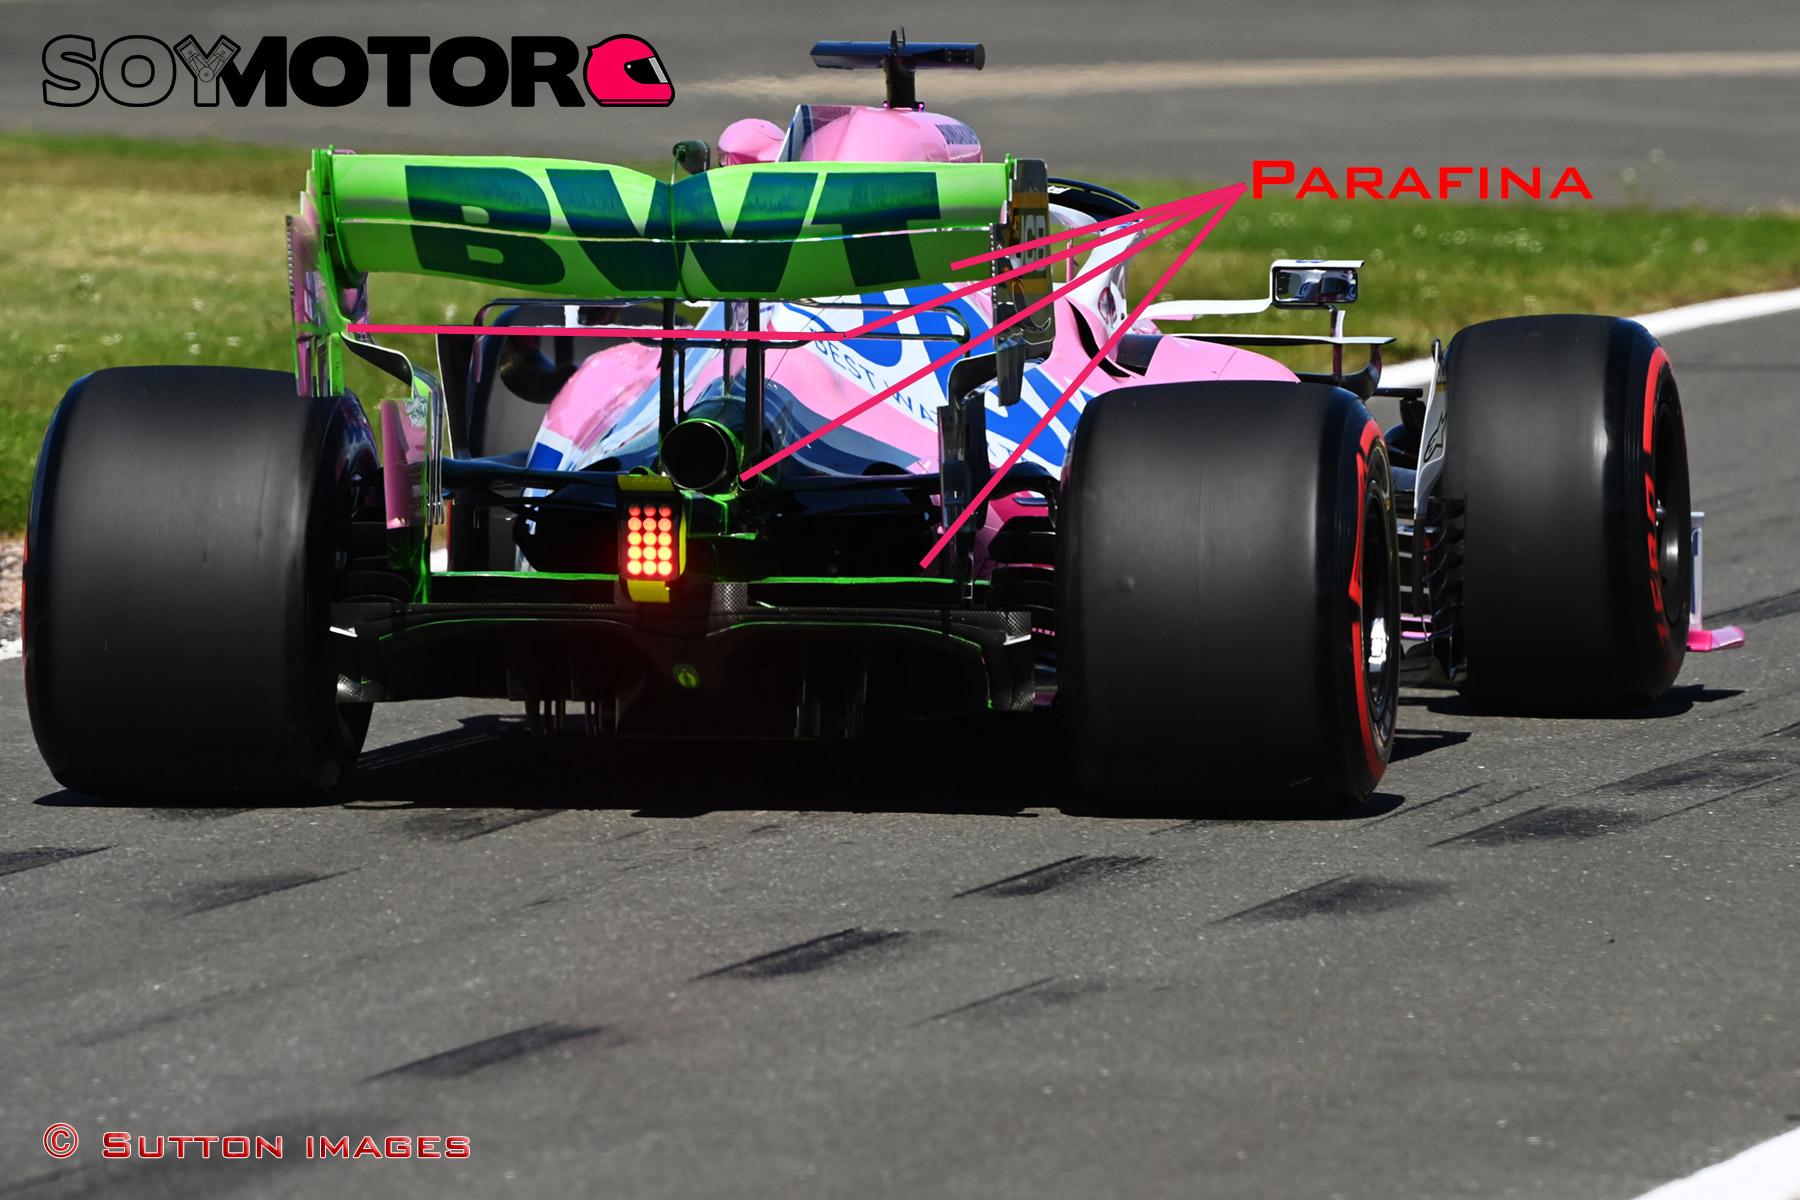 racing-point-parafina_0.jpg